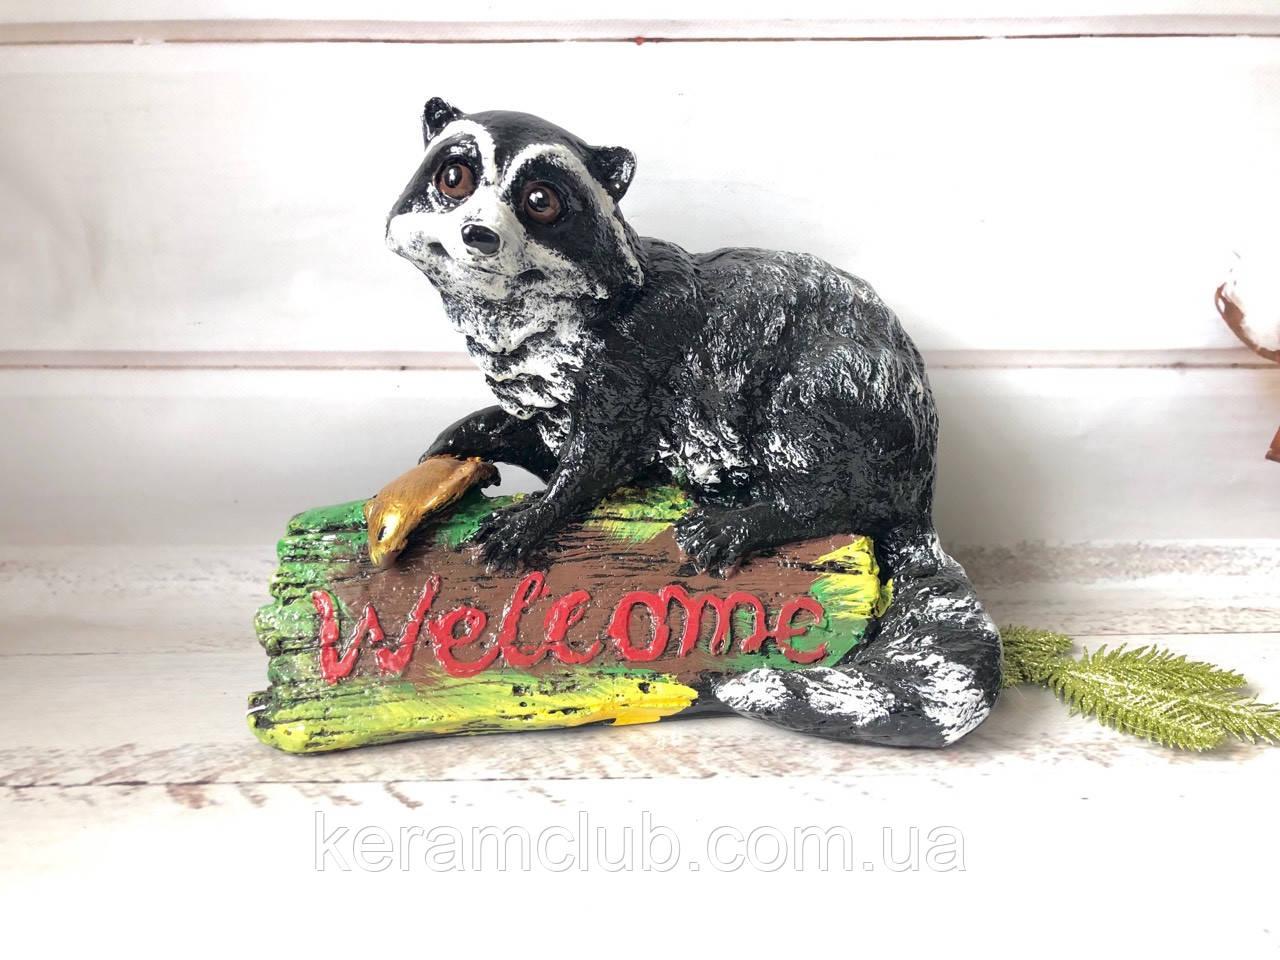 Садовая фигура: енот Welcome